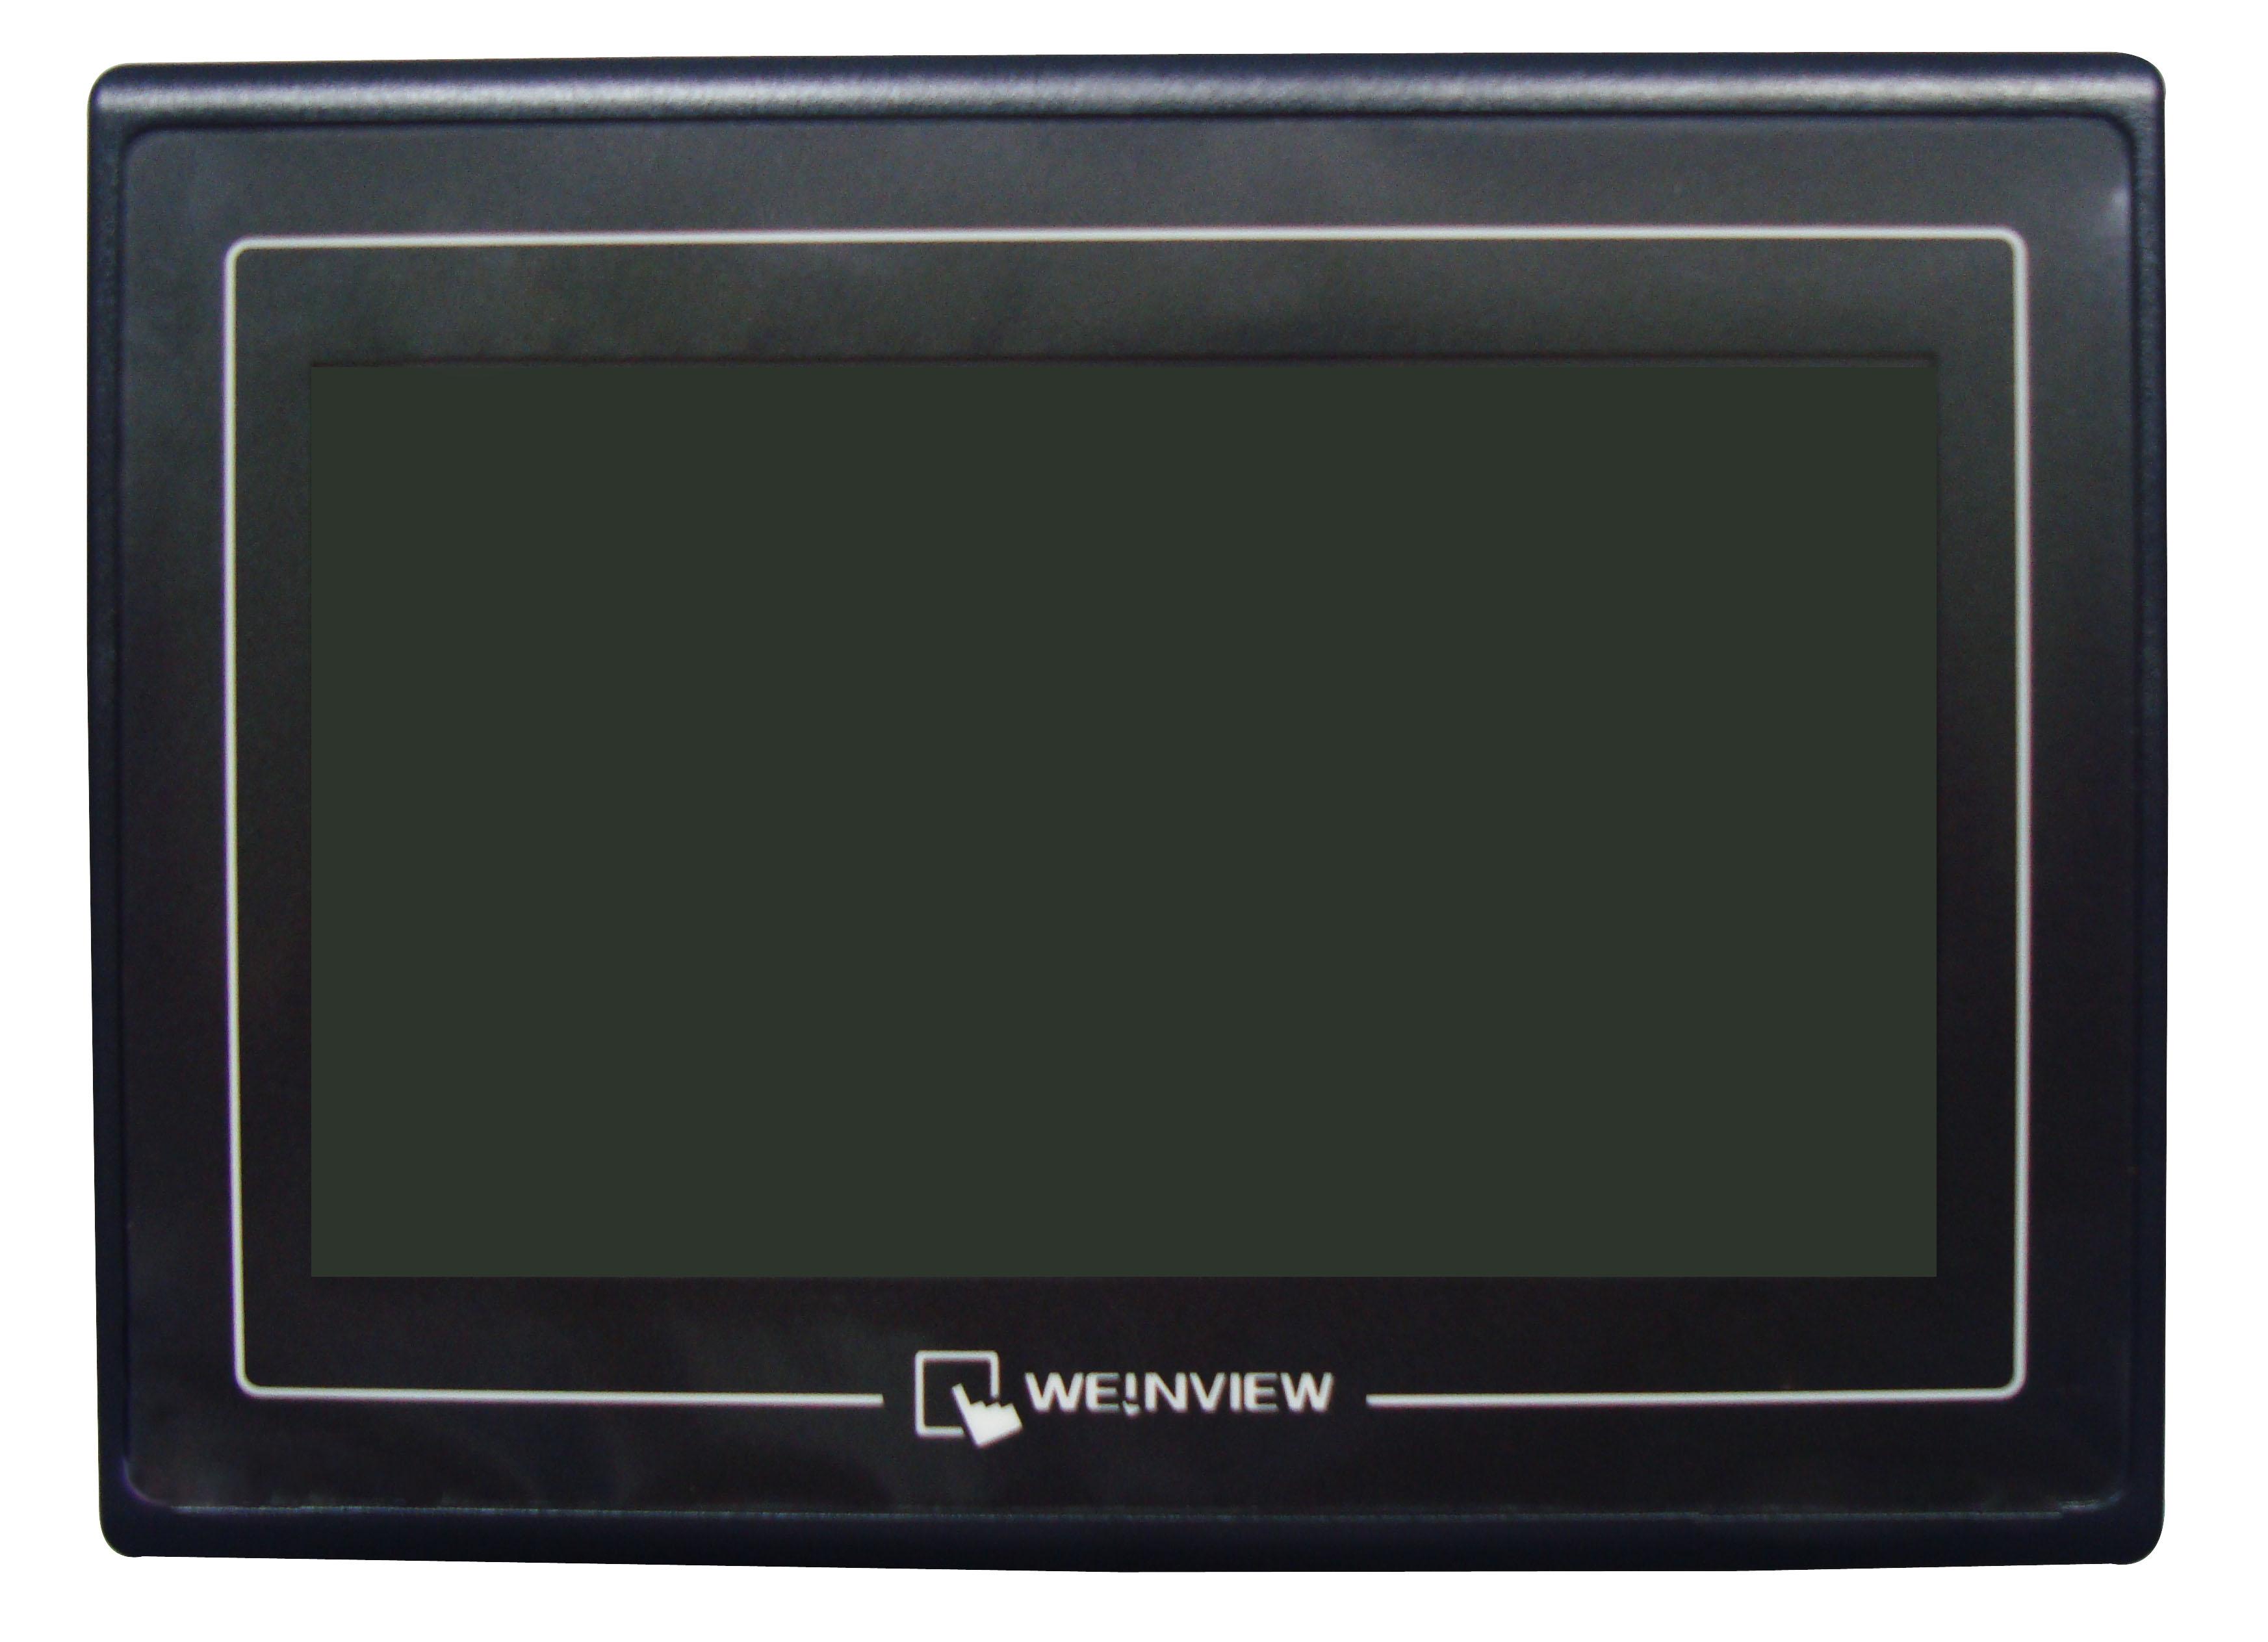 Электронные компоненты 海泰克hitech威纶通触摸屏下载线人机界面下载线